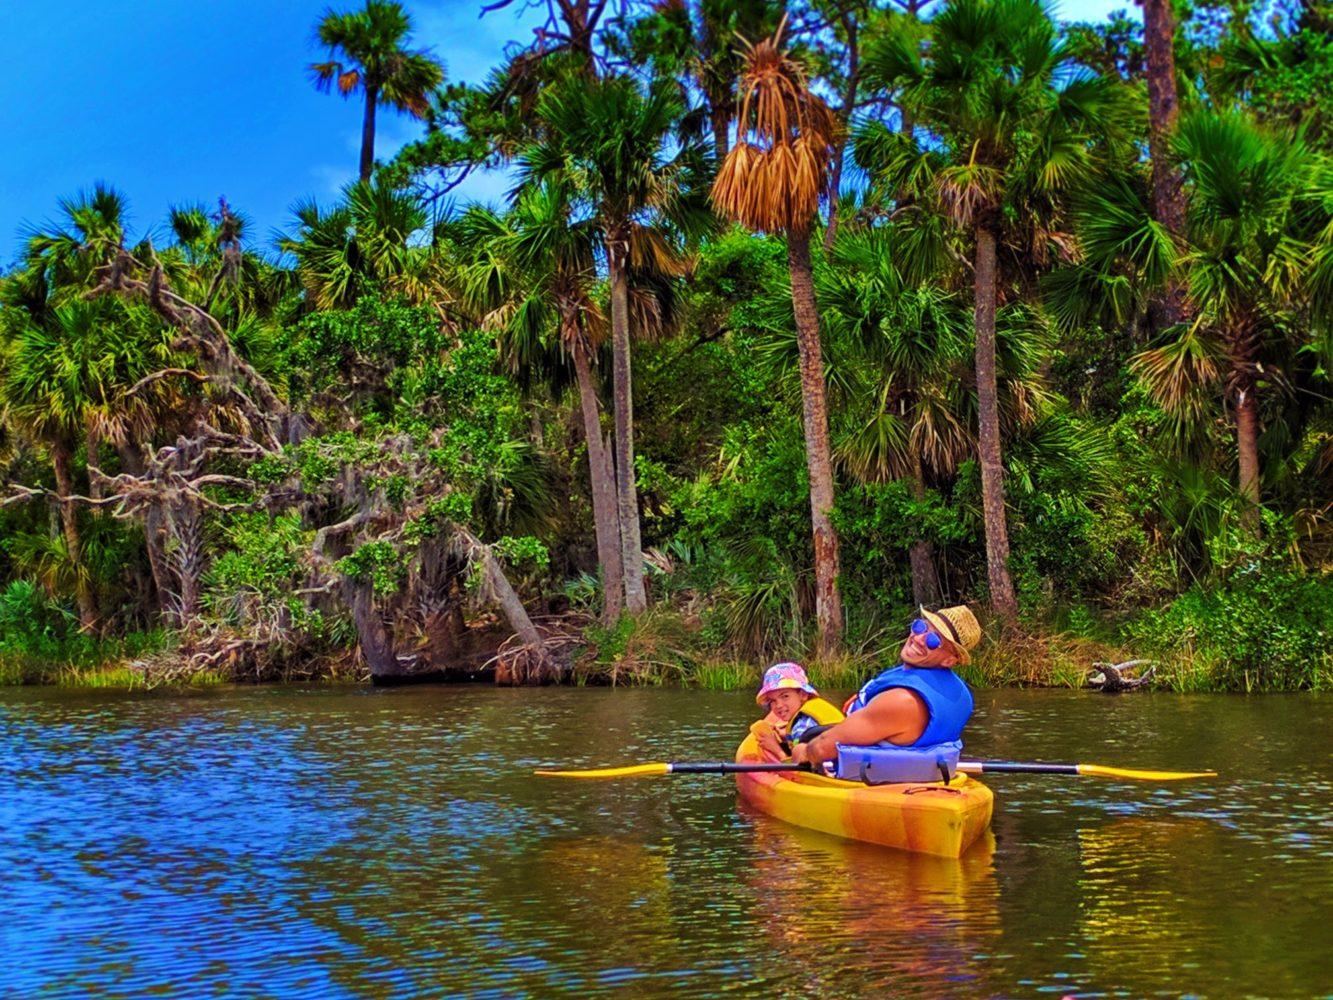 Taylor Family Kayaking In Tomoka State Park Daytona Beach